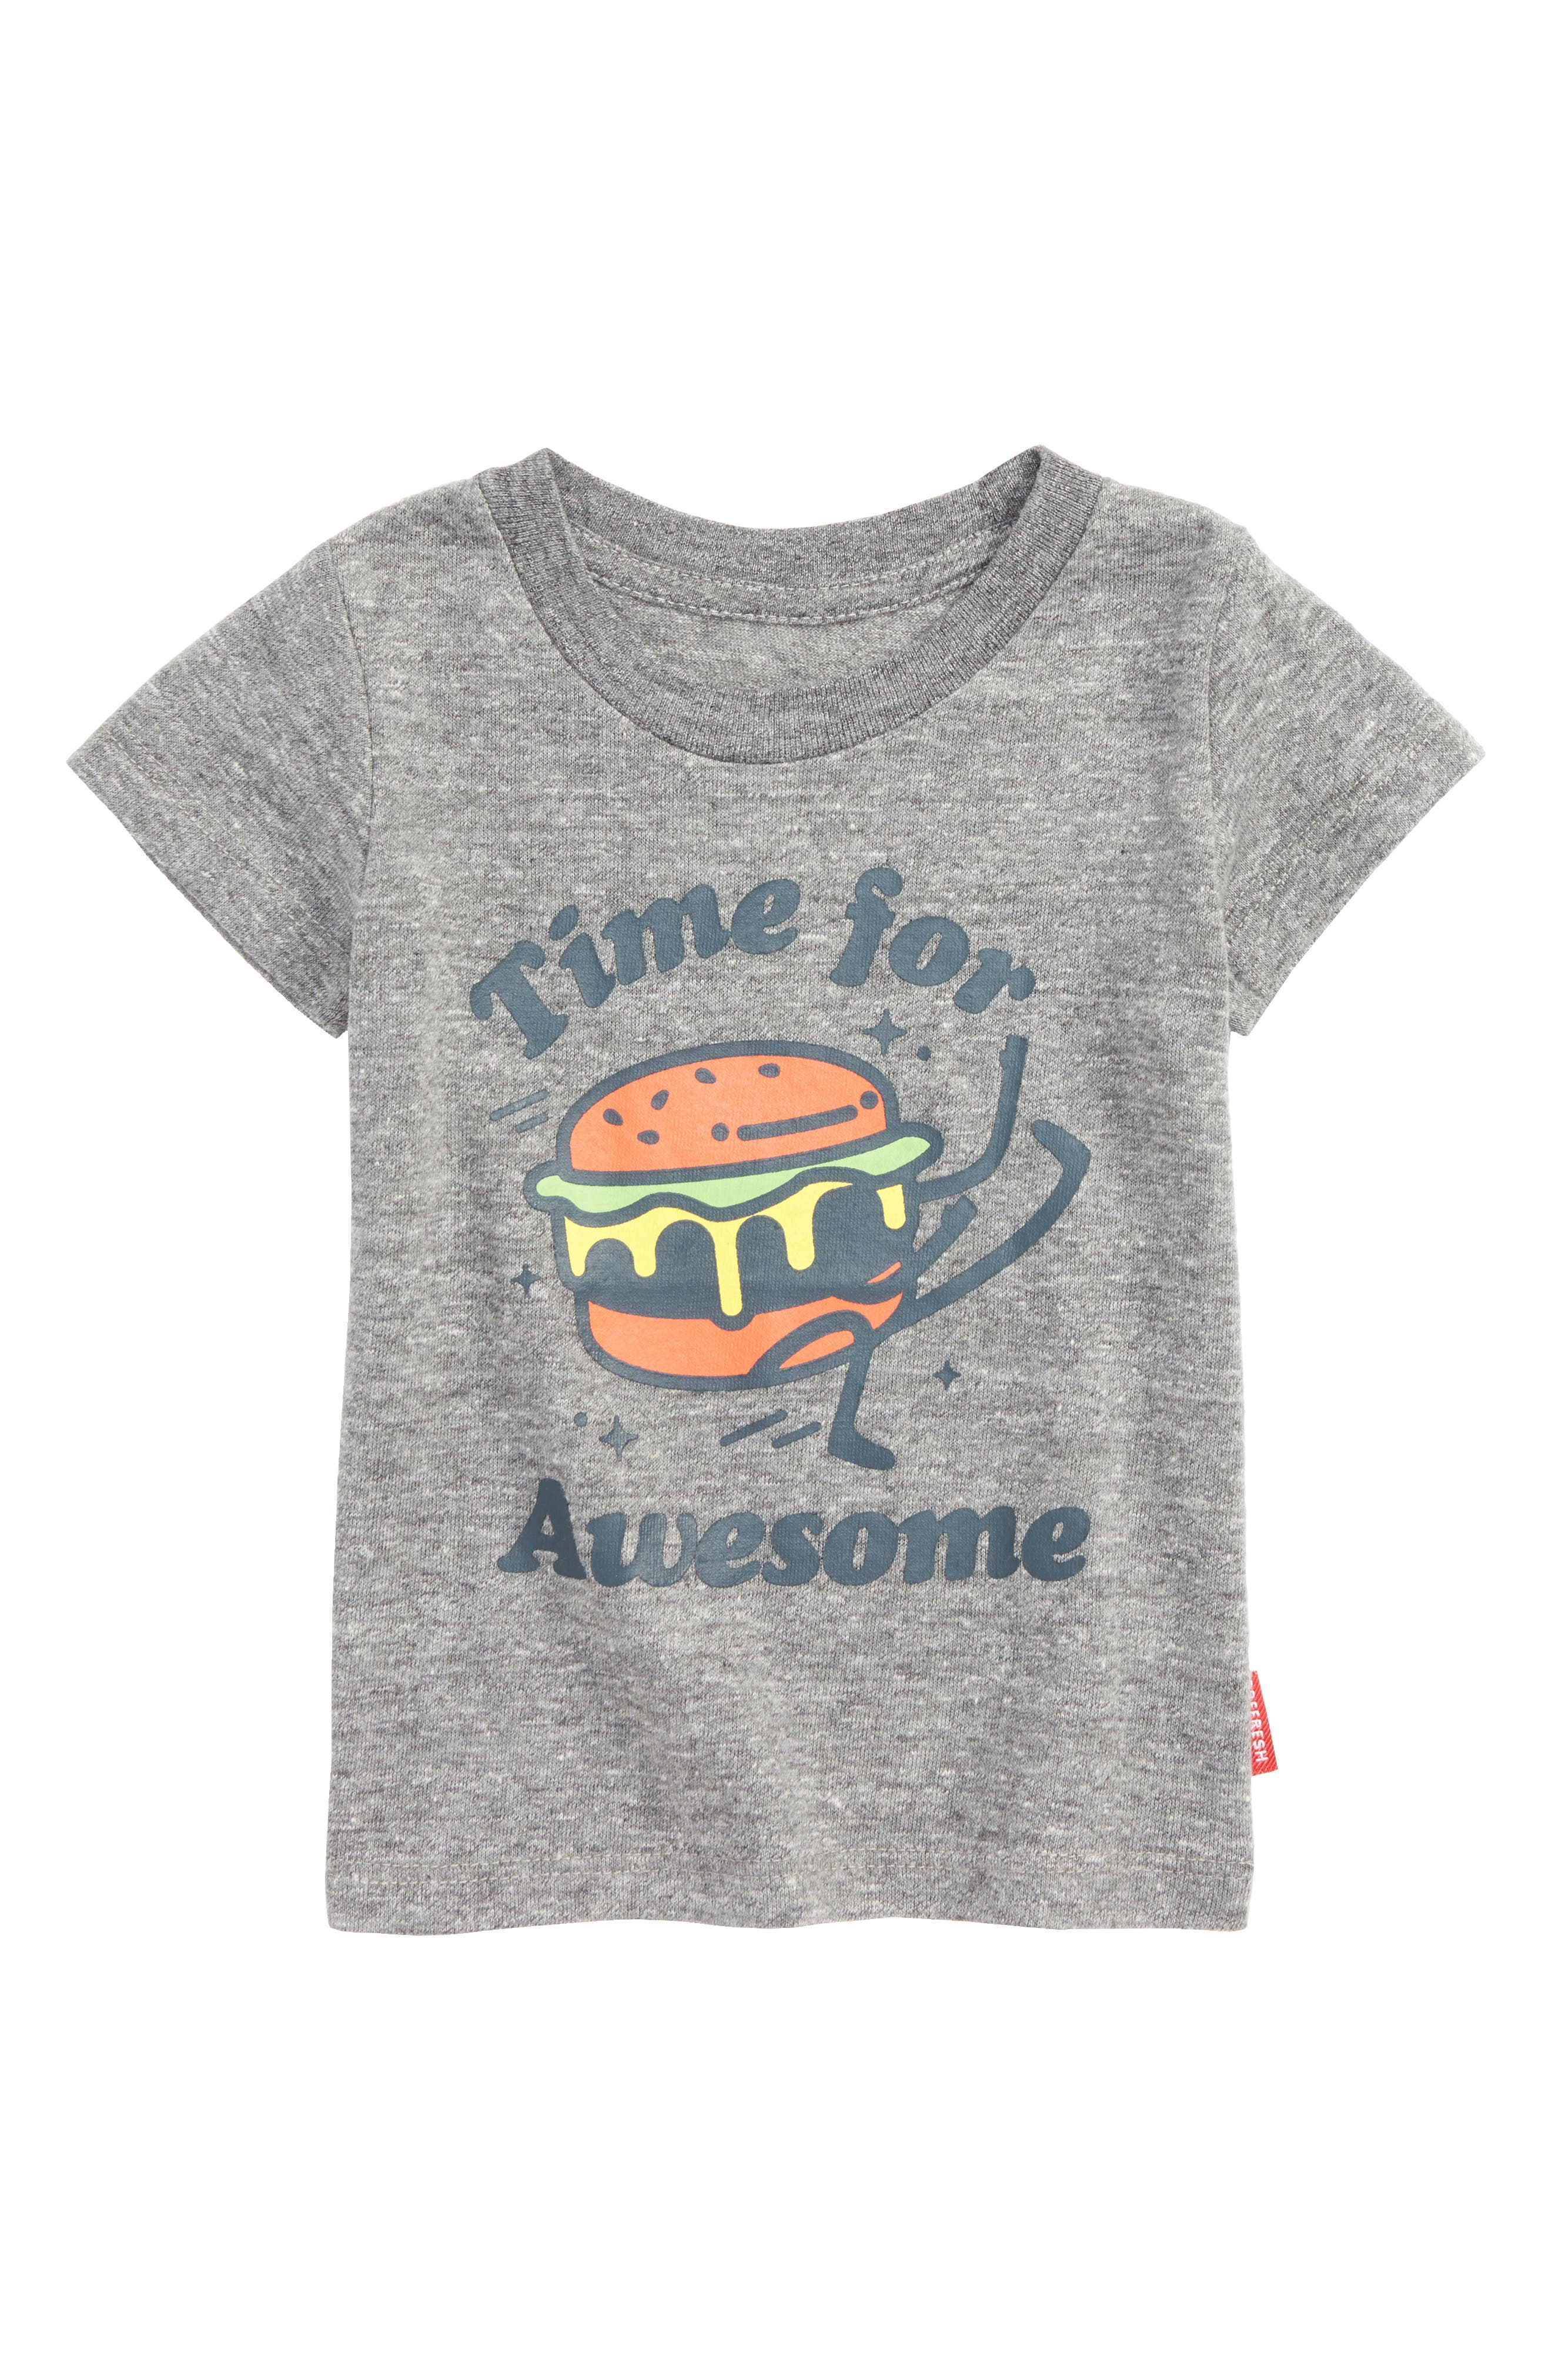 Main Image - Prefresh Awesome Burger Graphic T-Shirt (Baby)